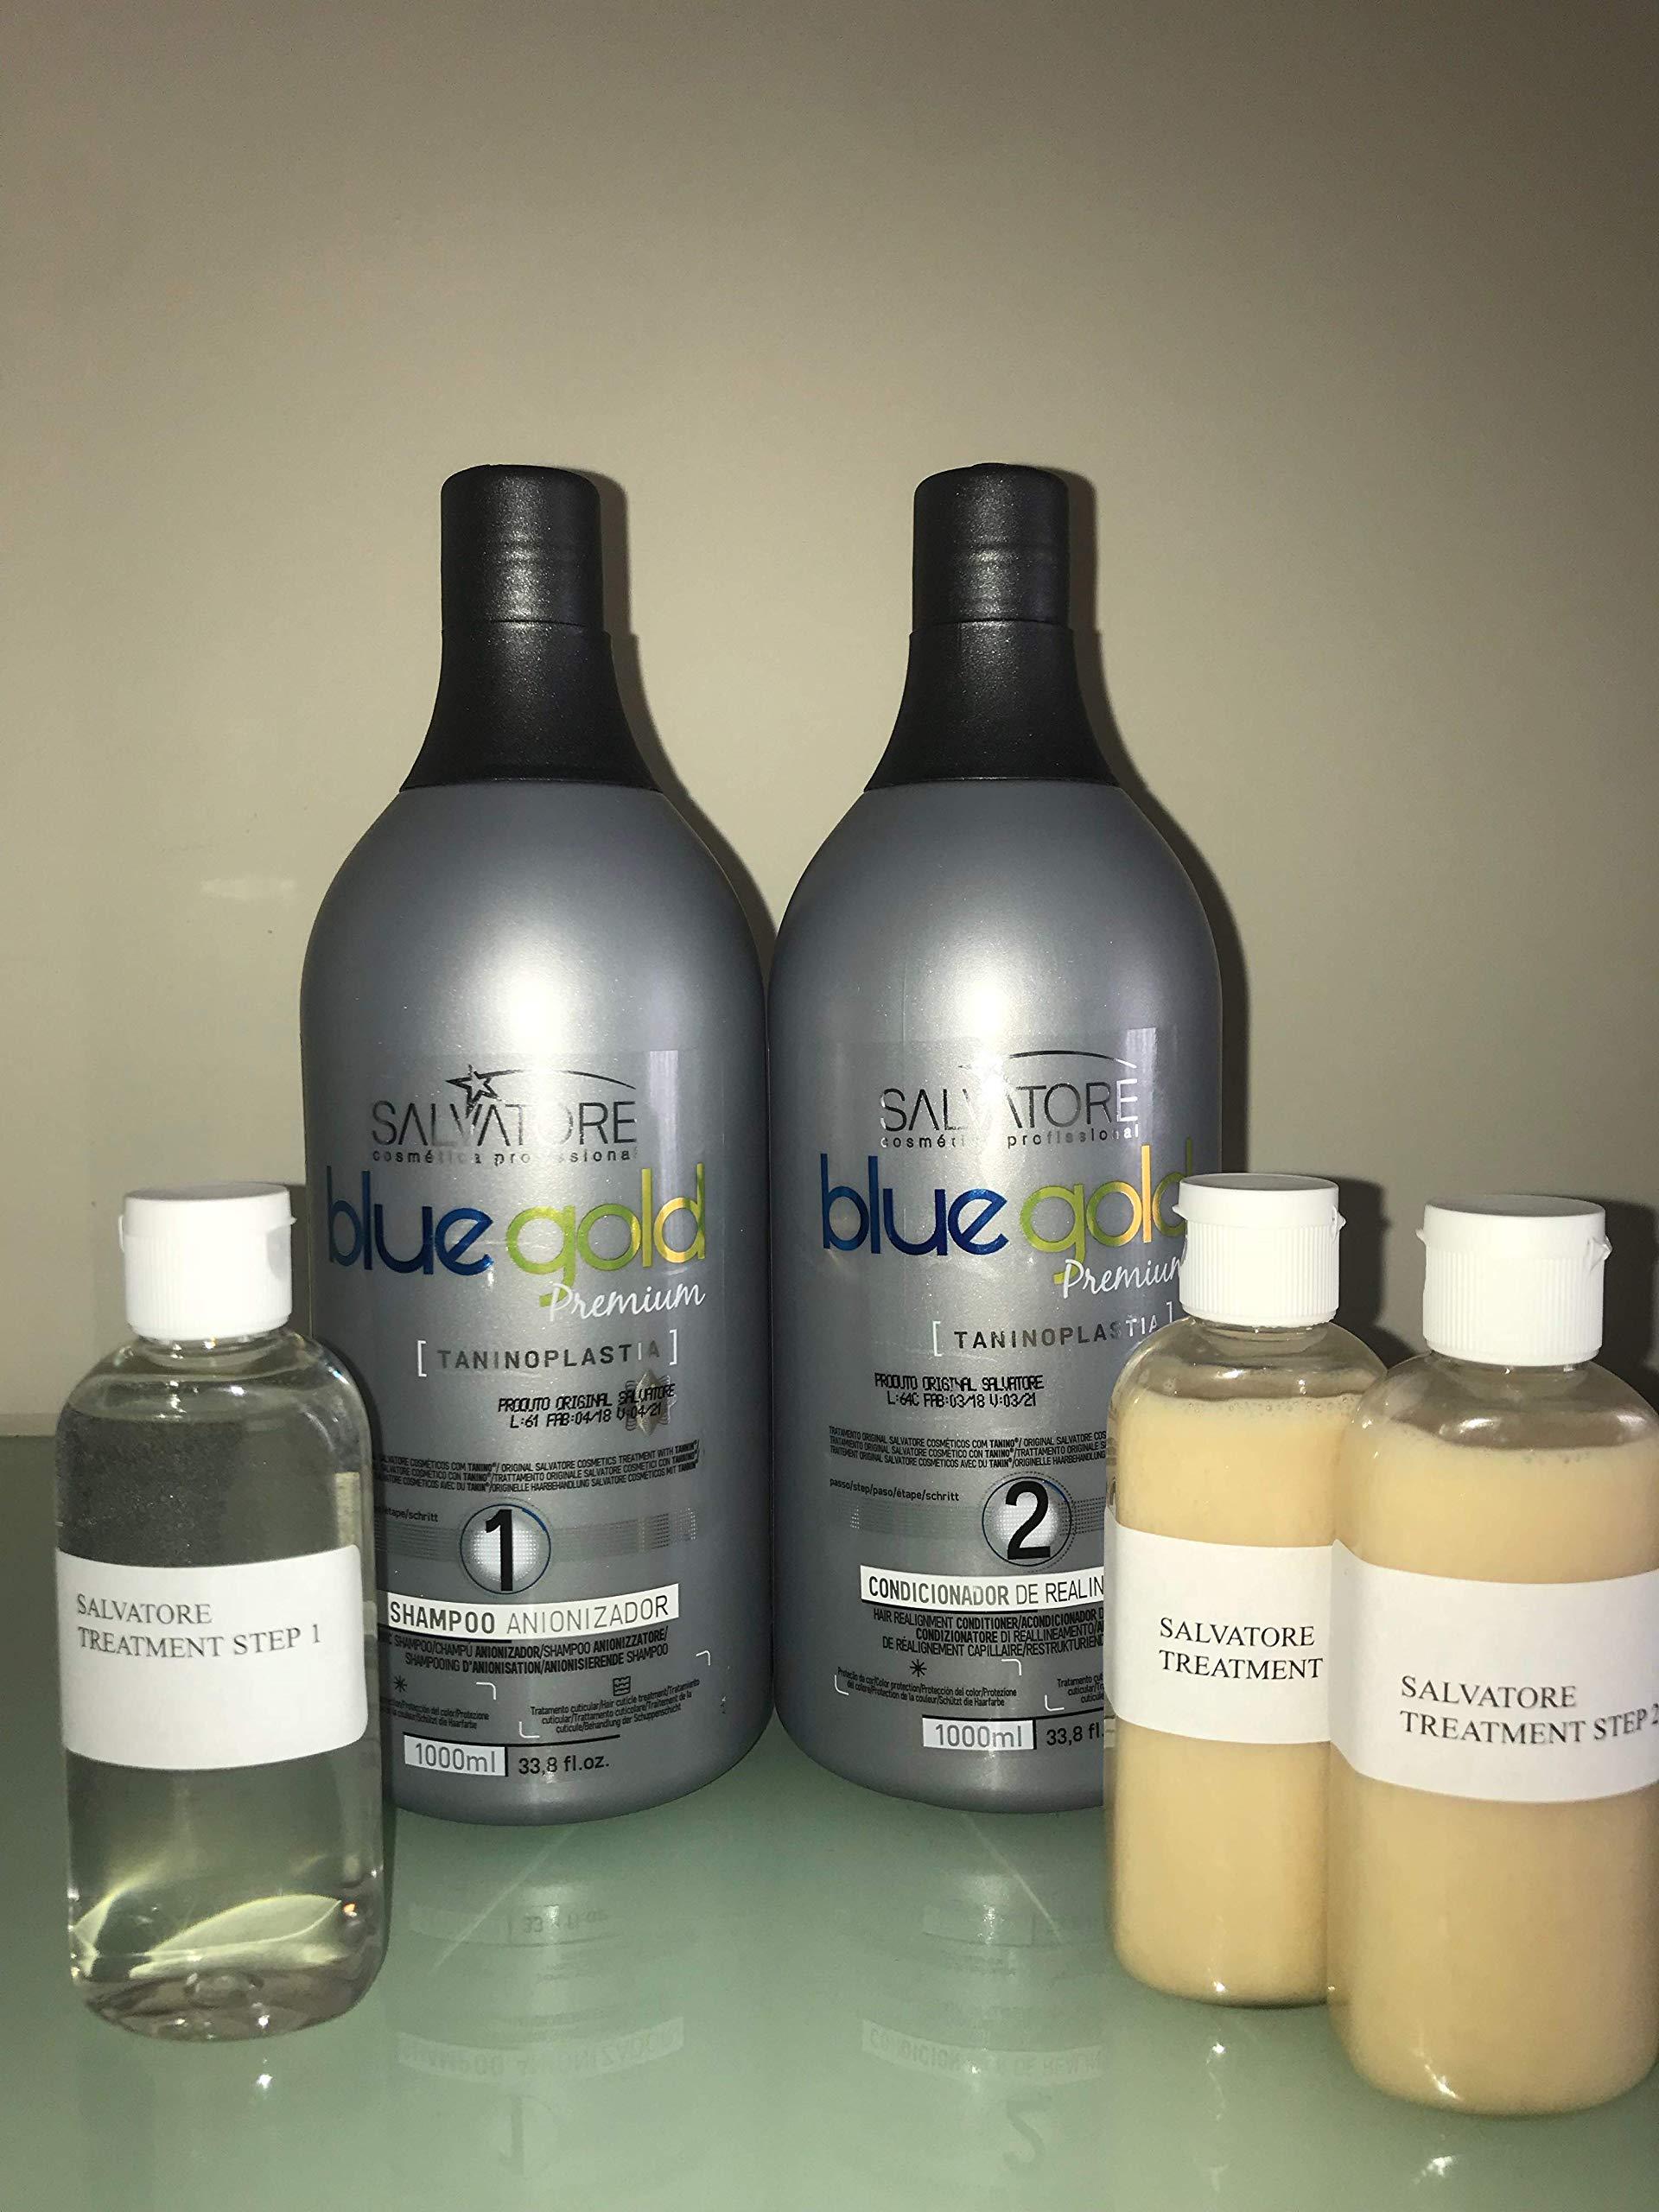 SALVATORE BLUE GOLD PREMIUM (3 X 100ML Shampoo and Keratin)